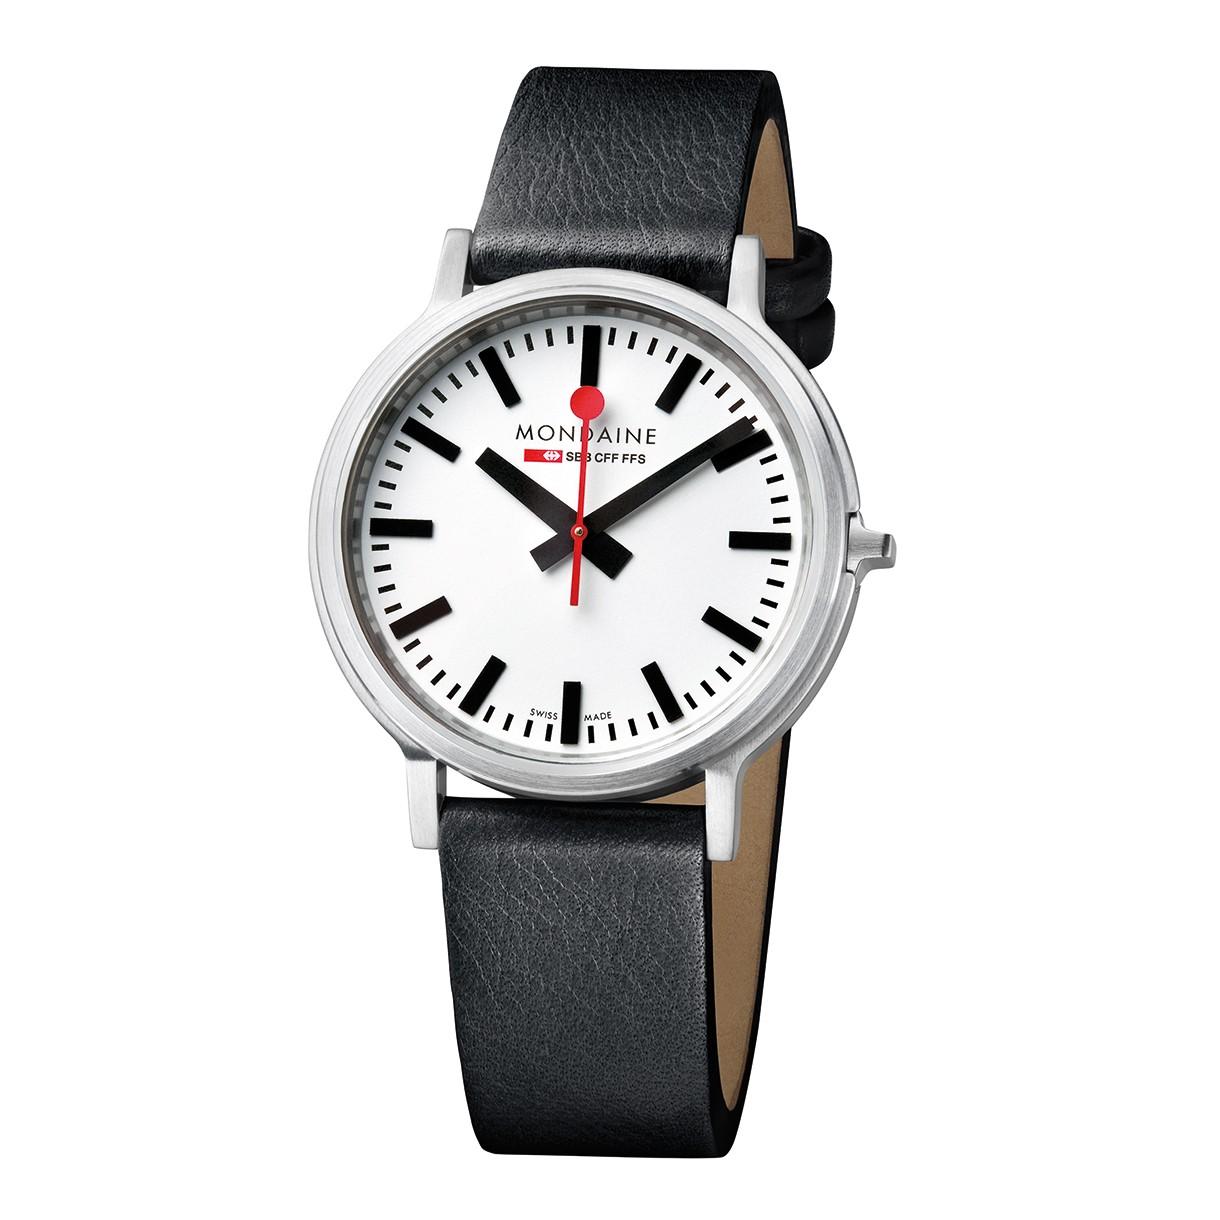 Mondaine swiss watch Stop2go A512.30358.16sbb